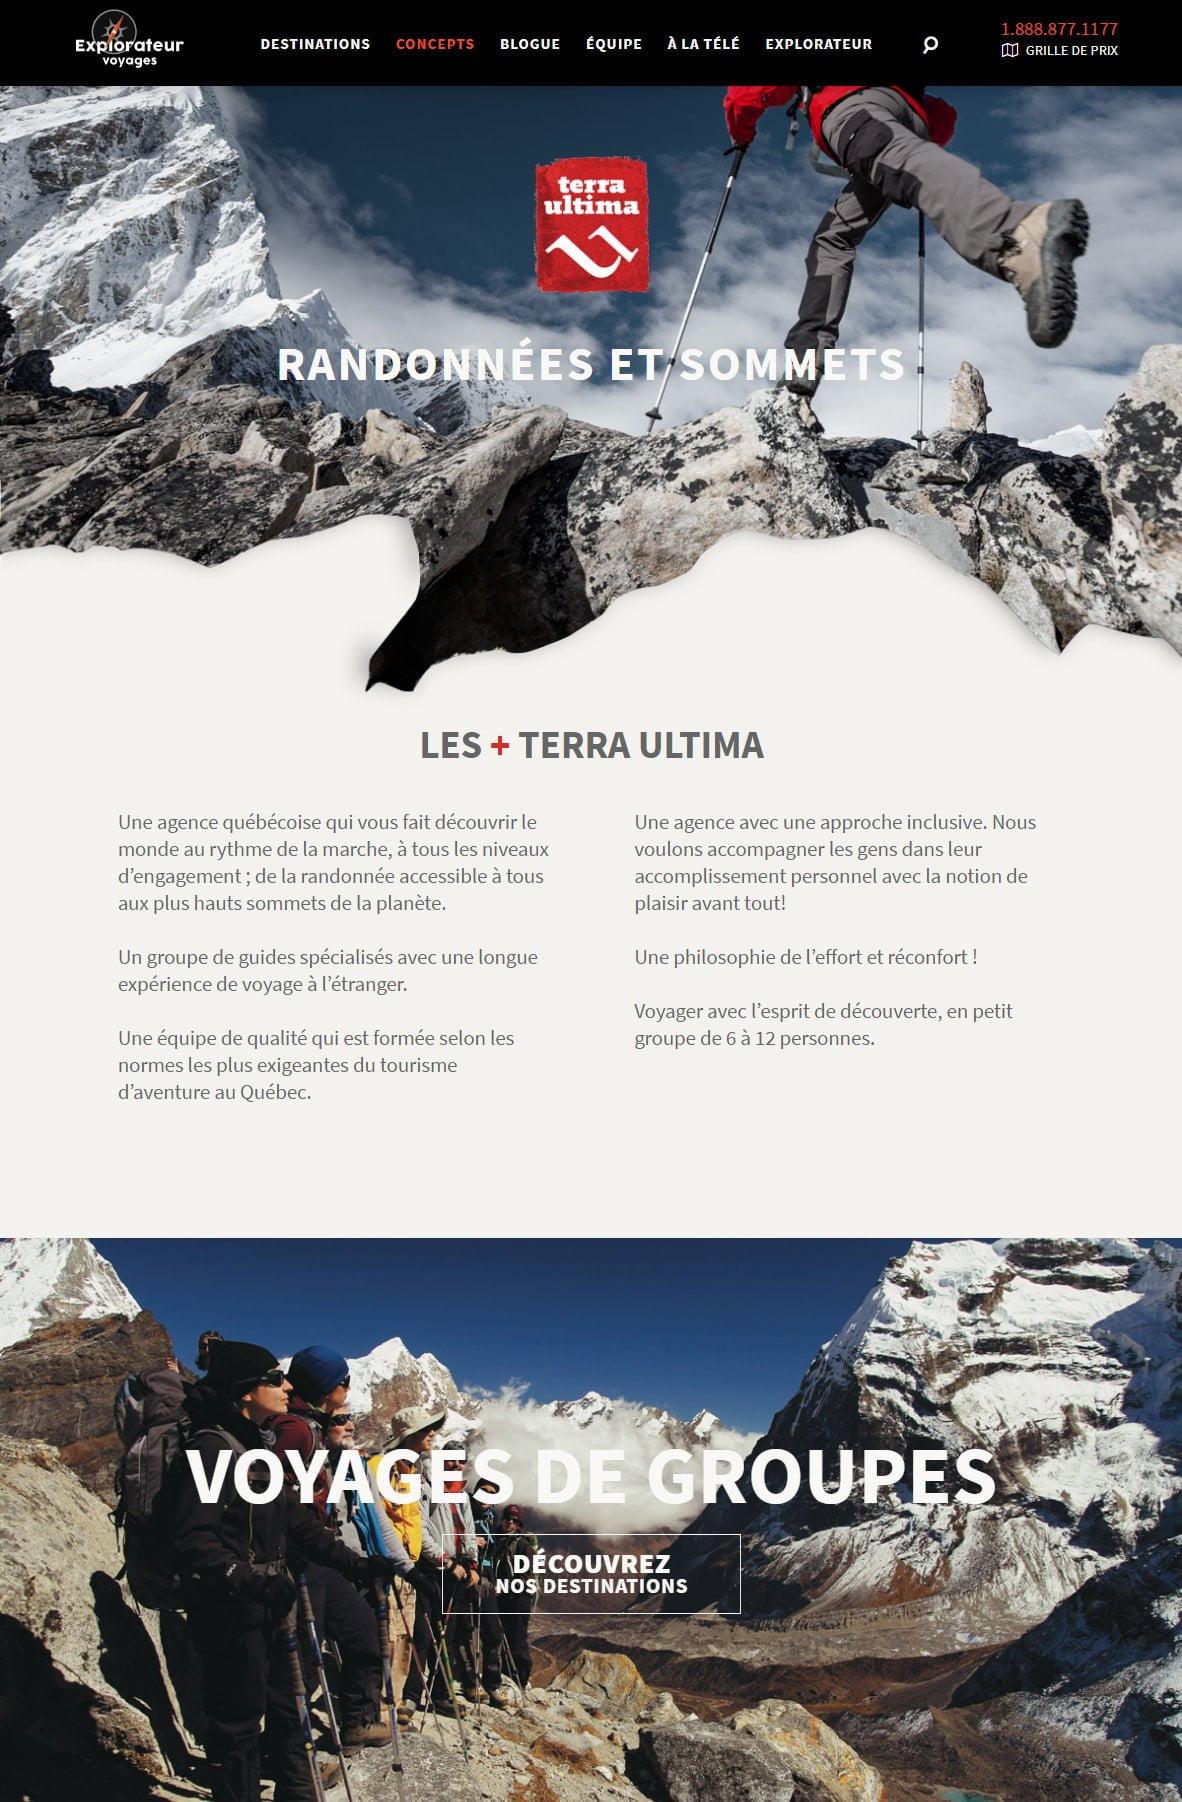 Explorateur Voyages - Portfolio 3 Tektonik